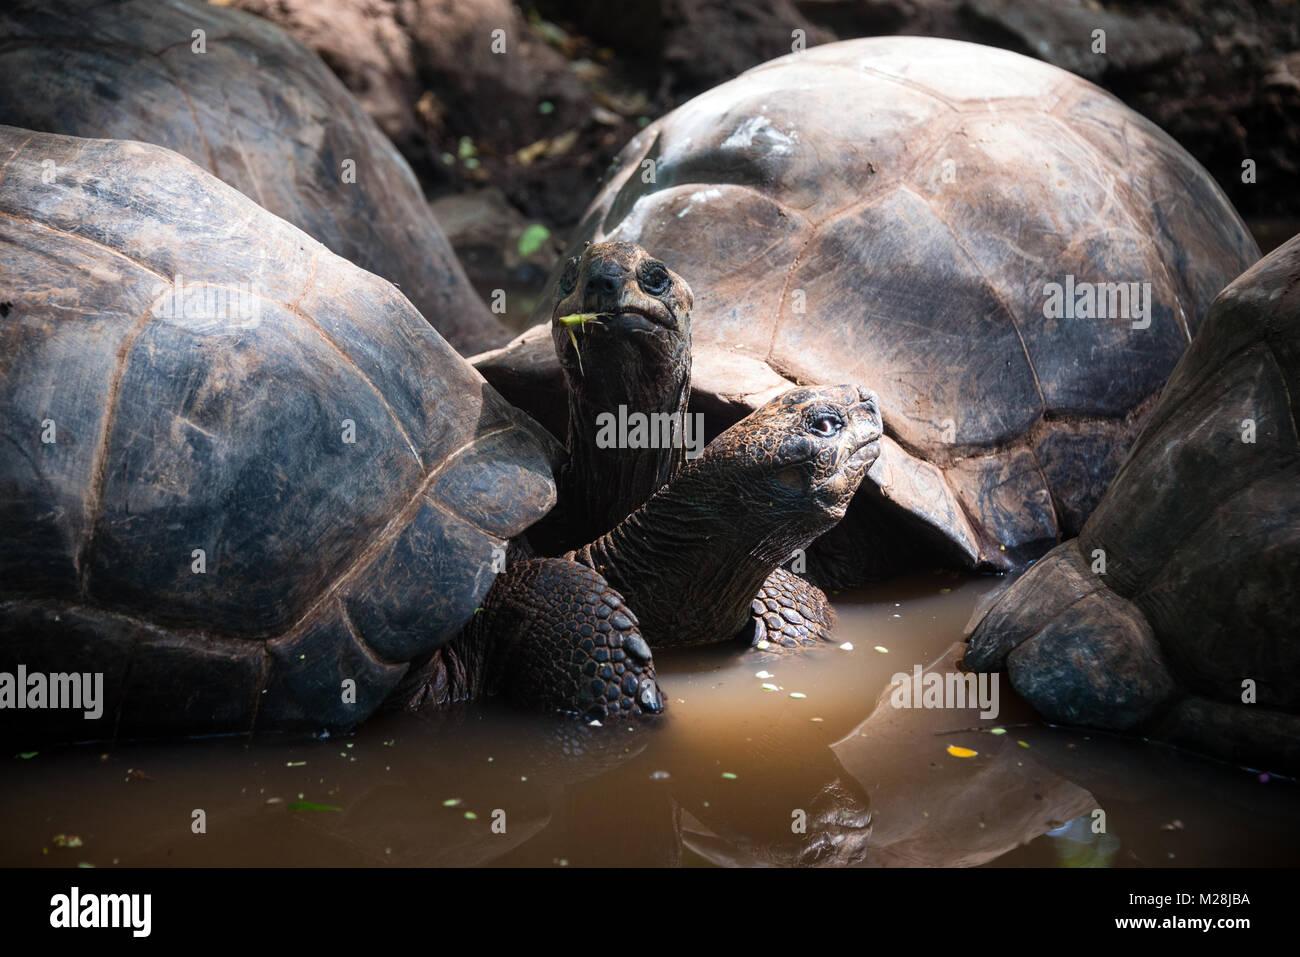 Aldabra giant tortoises in turtle sanctuary, on Prison island reservation, Zanzibar - Stock Image